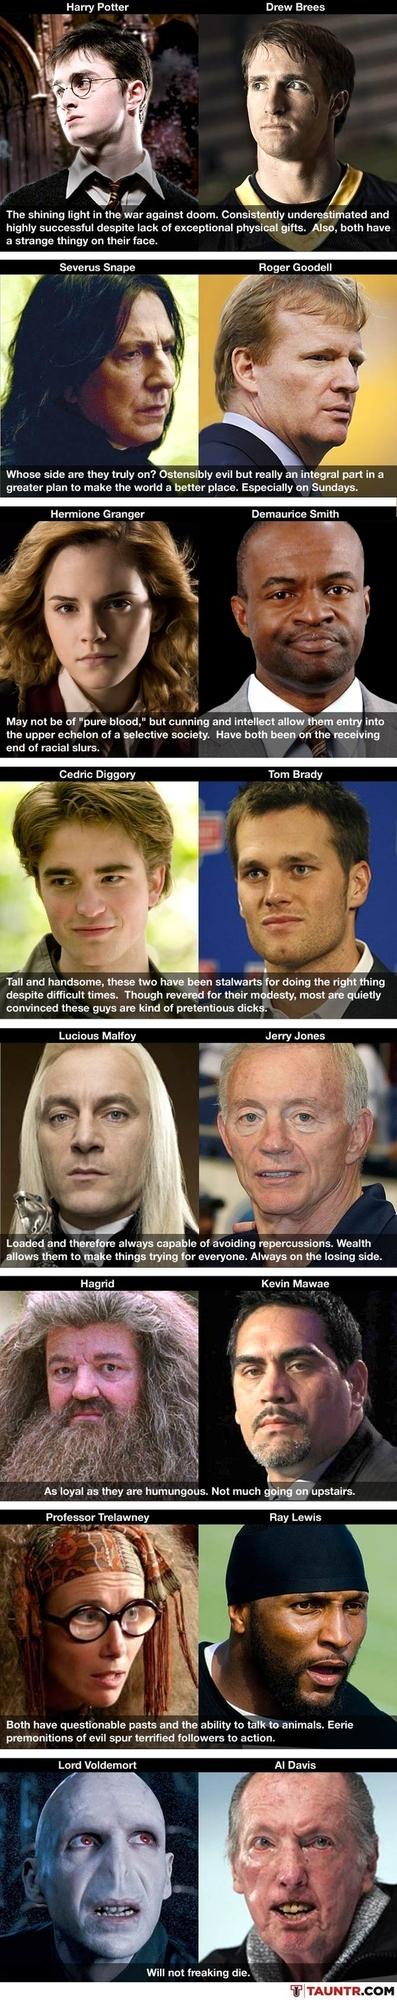 Harry Potter NFL Lockout Comparisons